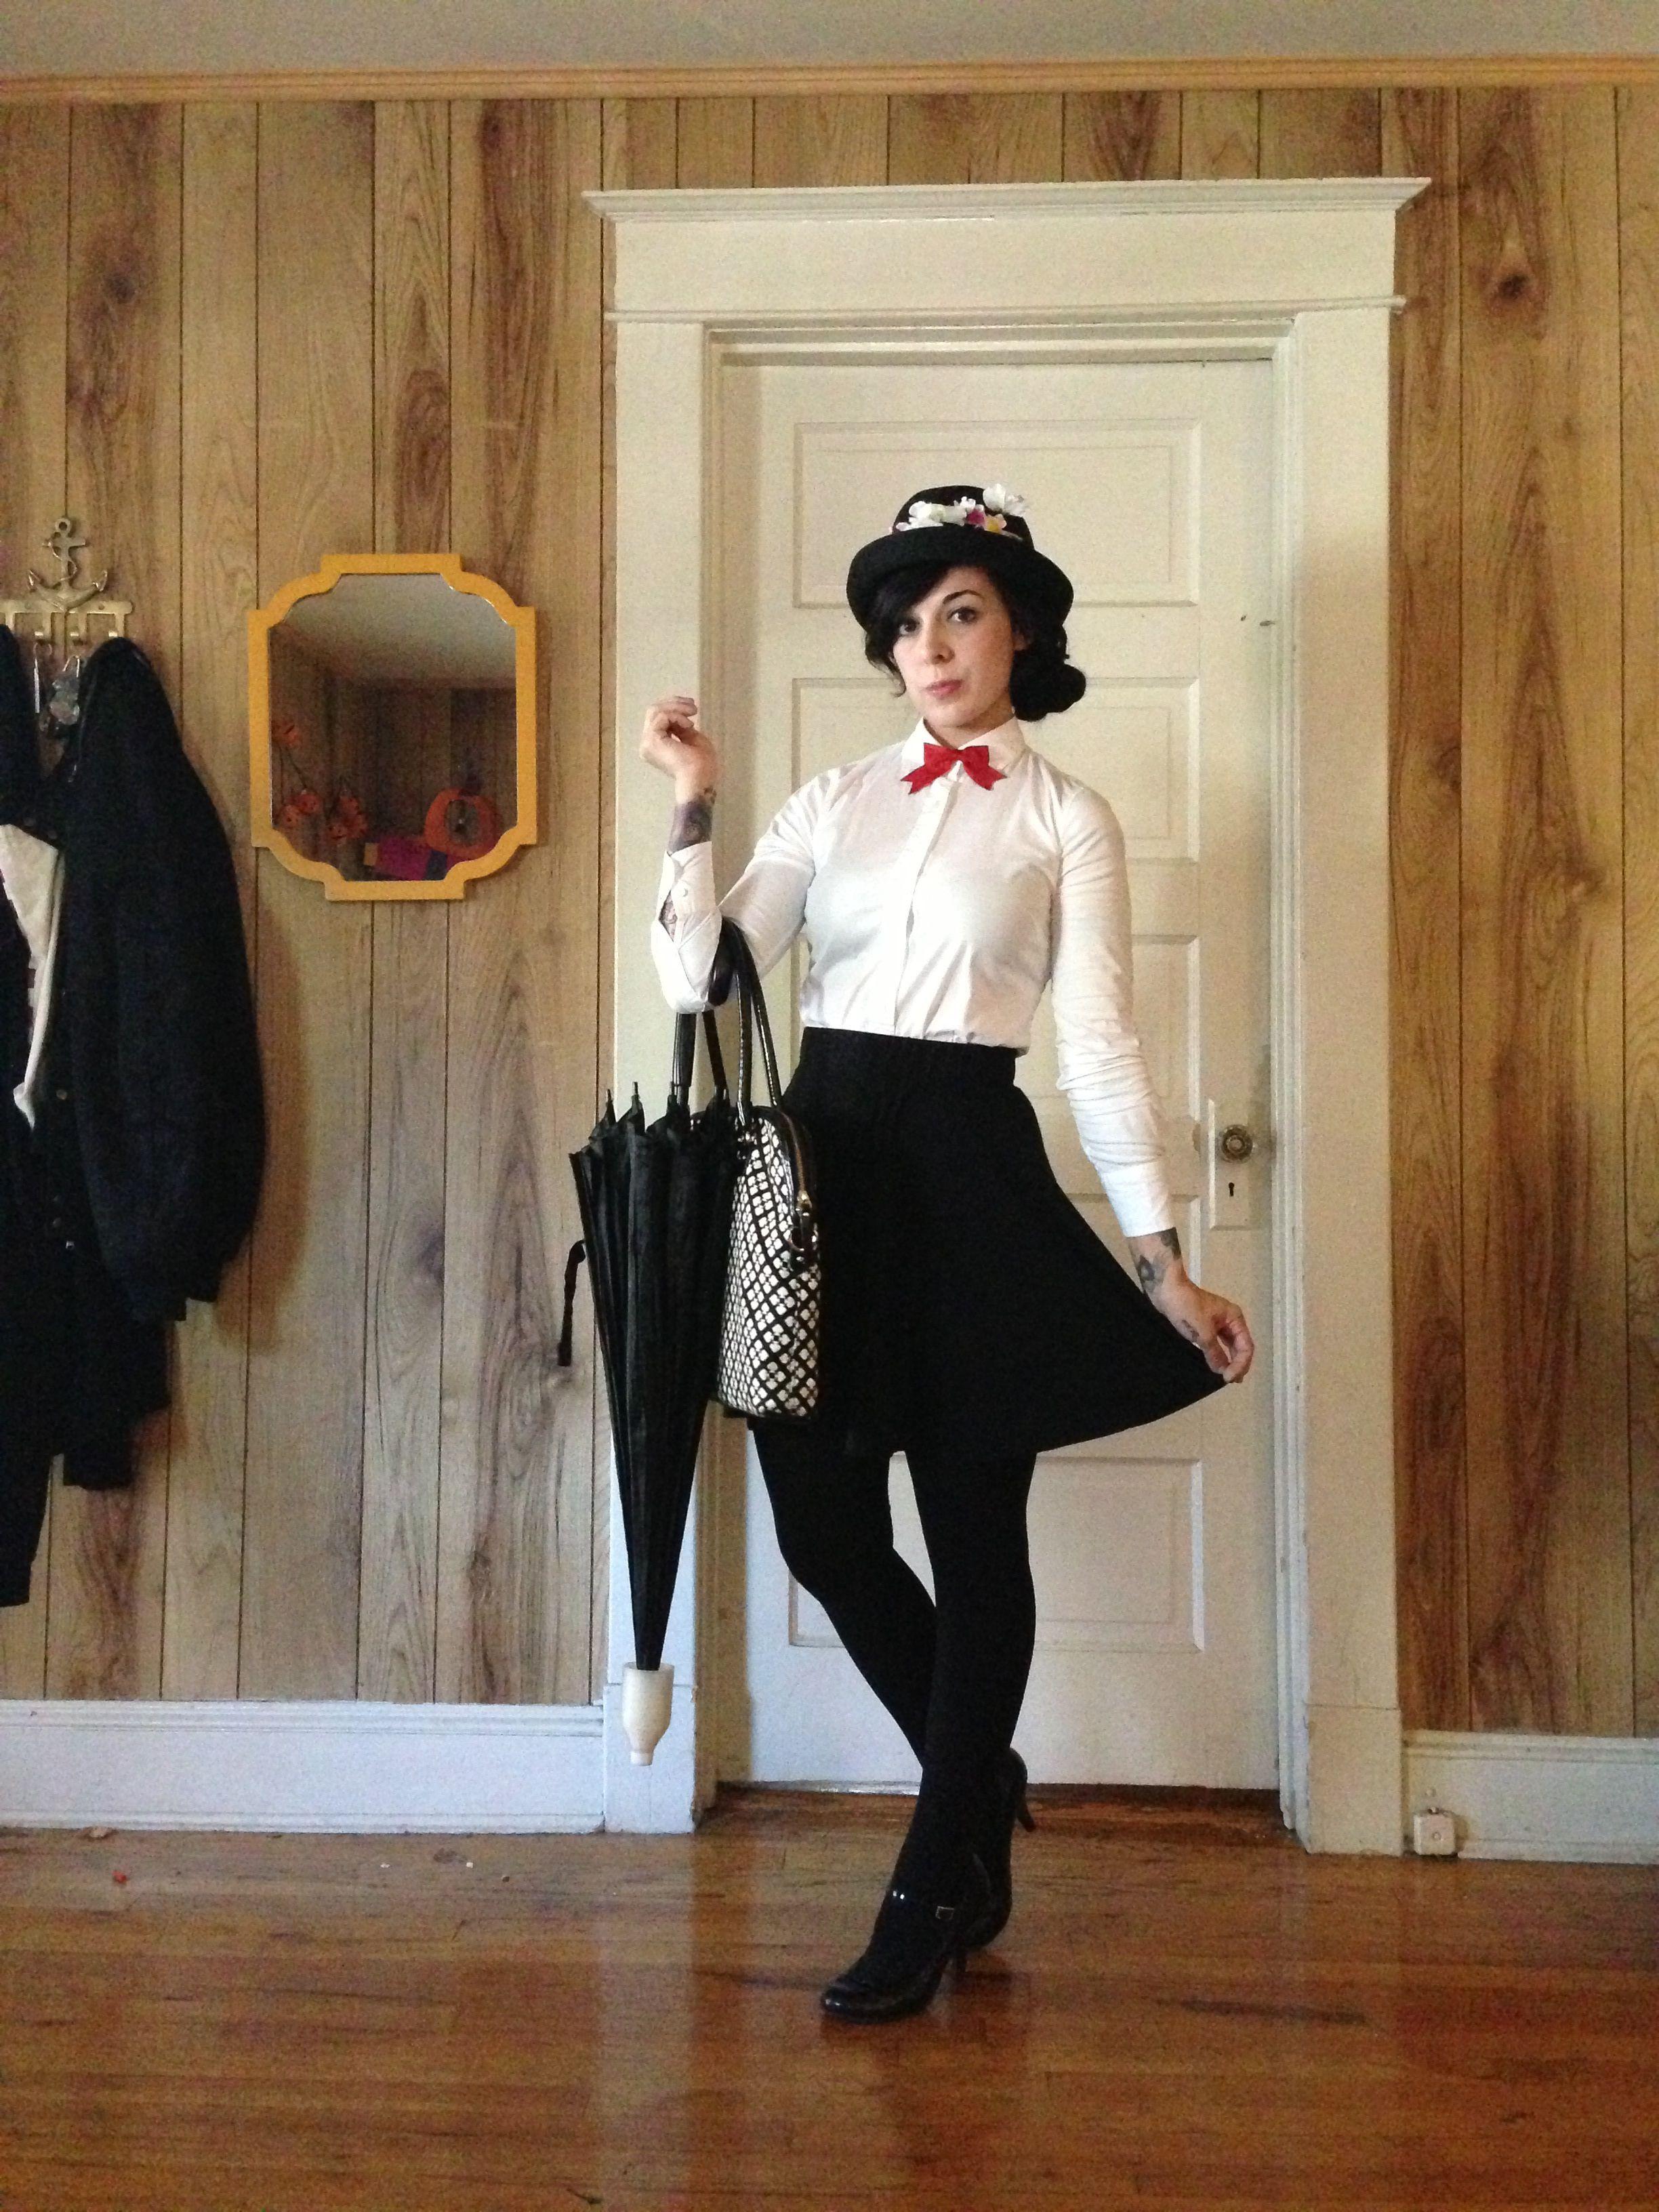 mary poppins halloween costume diy halloween diy